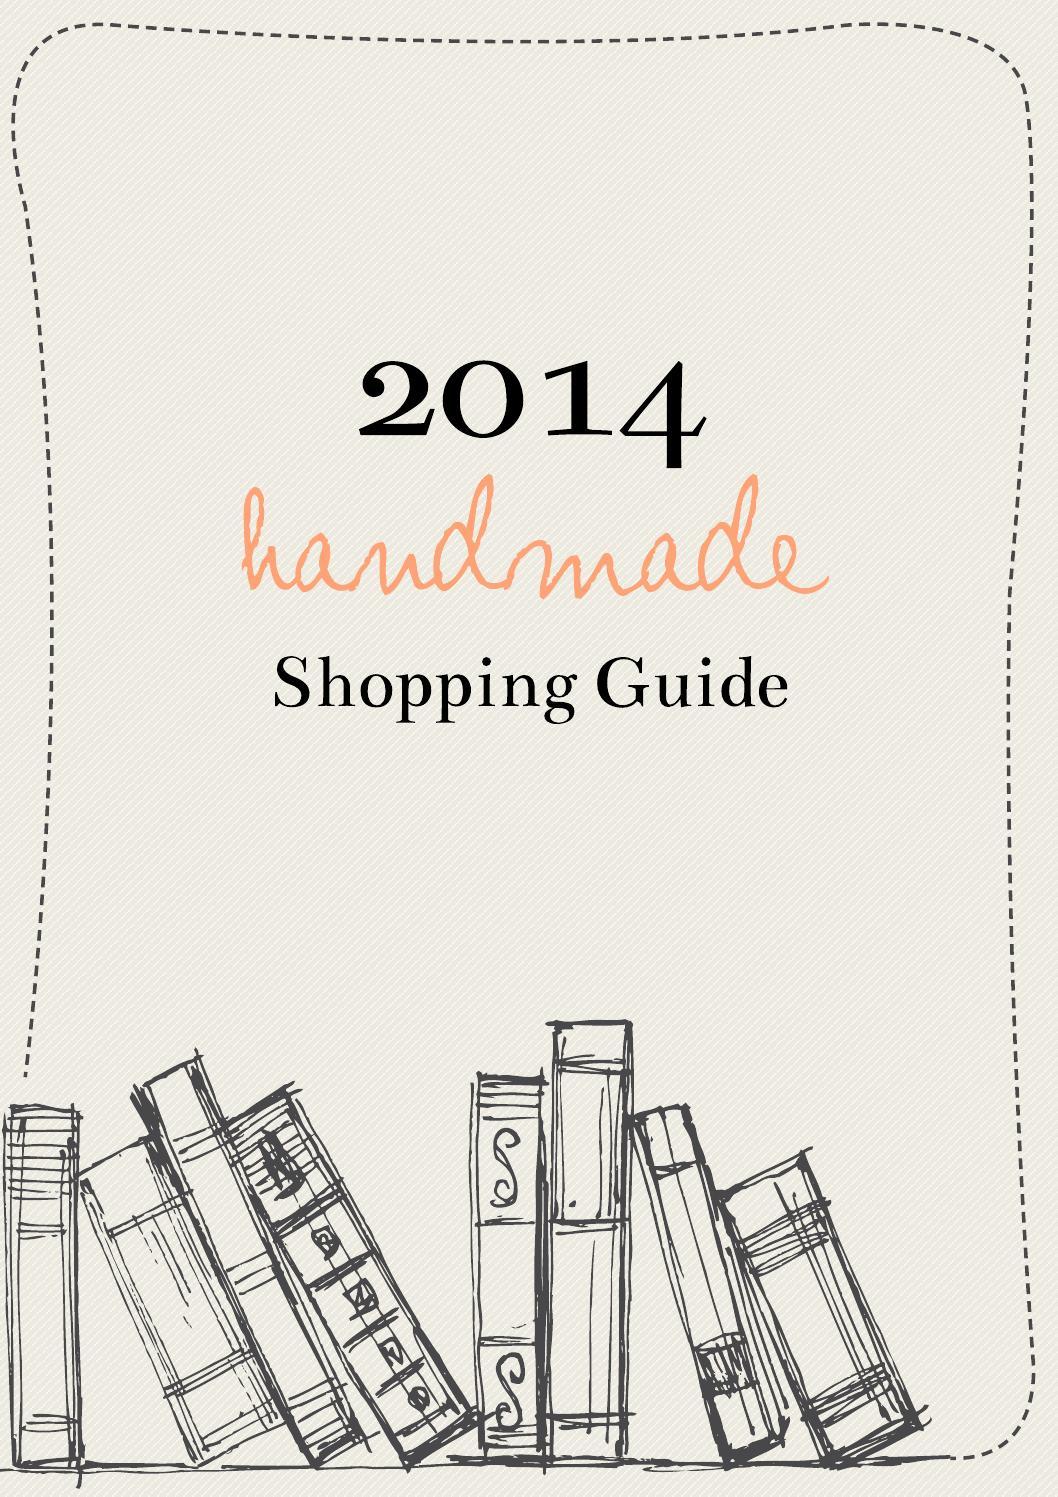 2014 handmade shopping guide by bespoke issuu